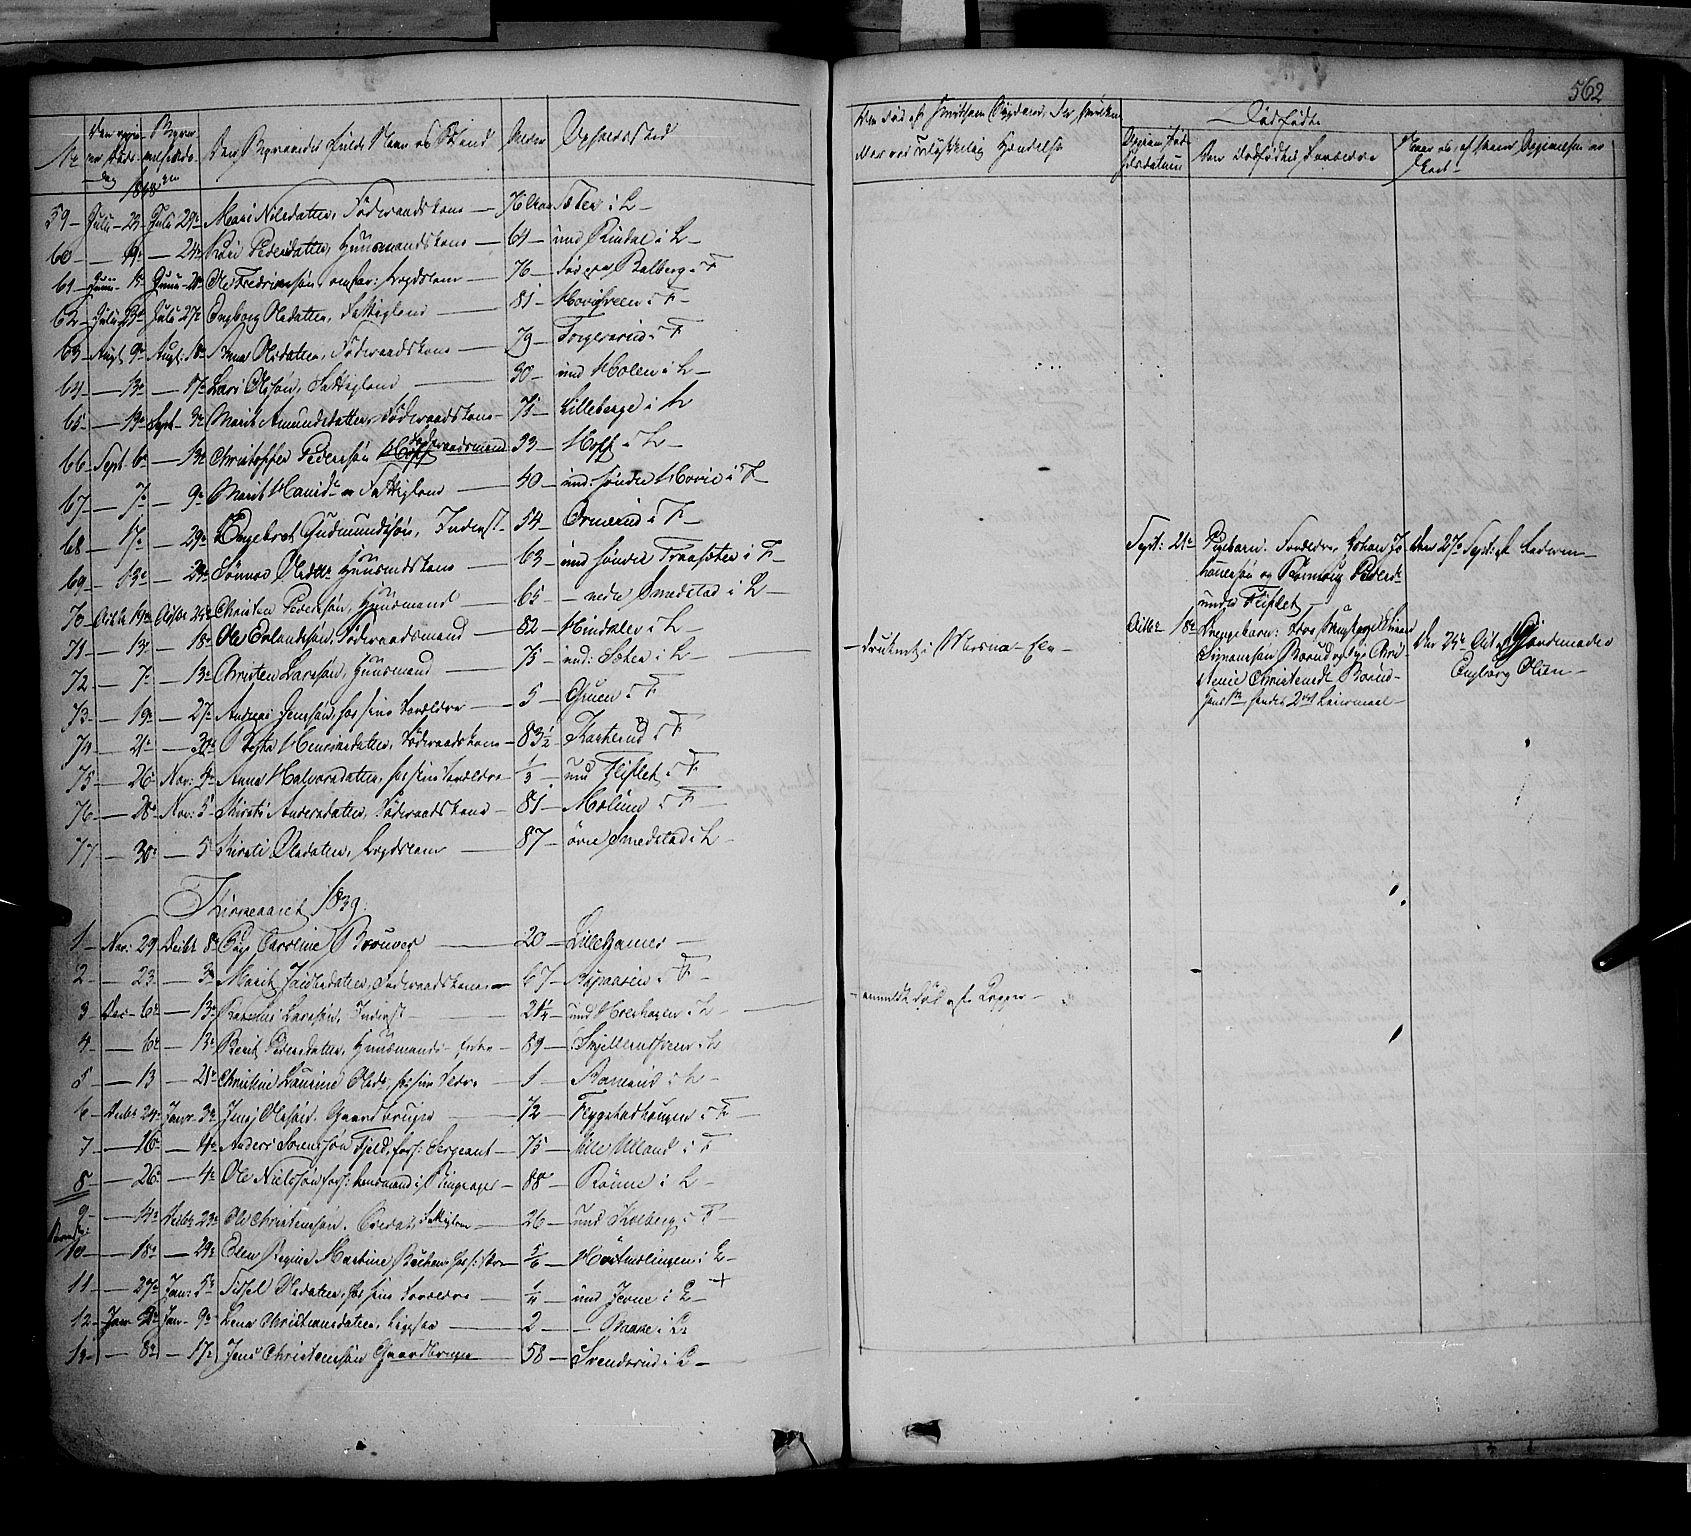 SAH, Fåberg prestekontor, Ministerialbok nr. 5, 1836-1854, s. 561-562